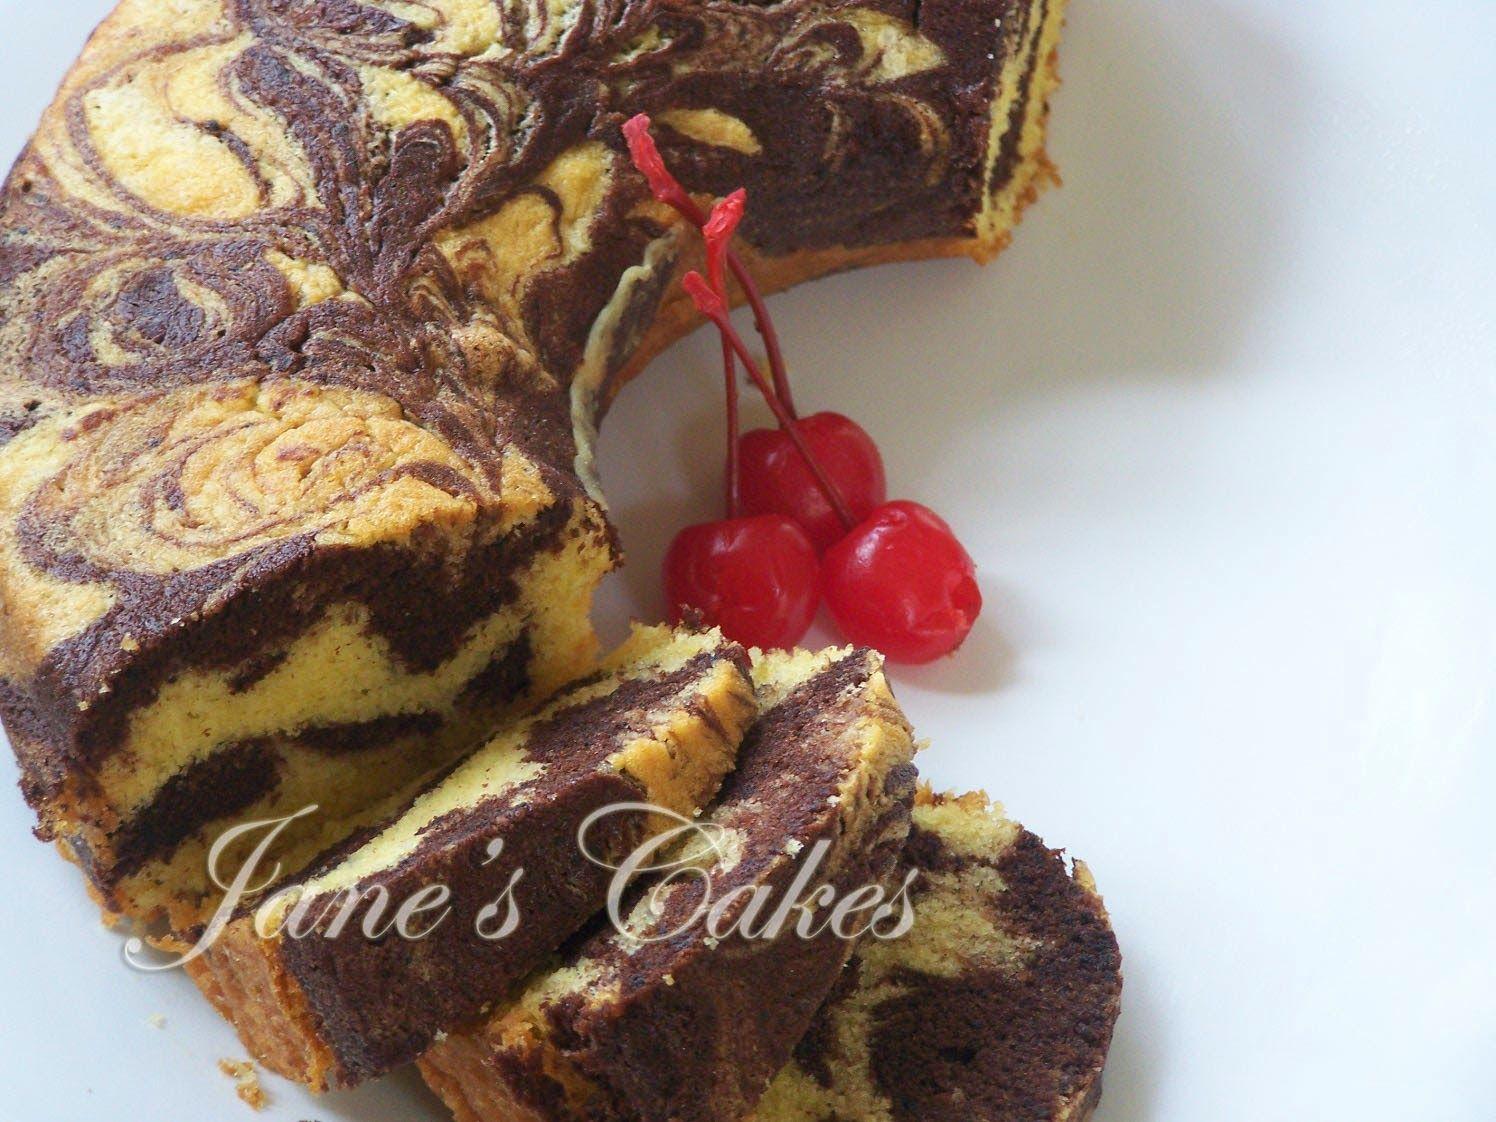 Resep Aneka Cokelat Resep Marmer Cake Keju Indonesian stuff